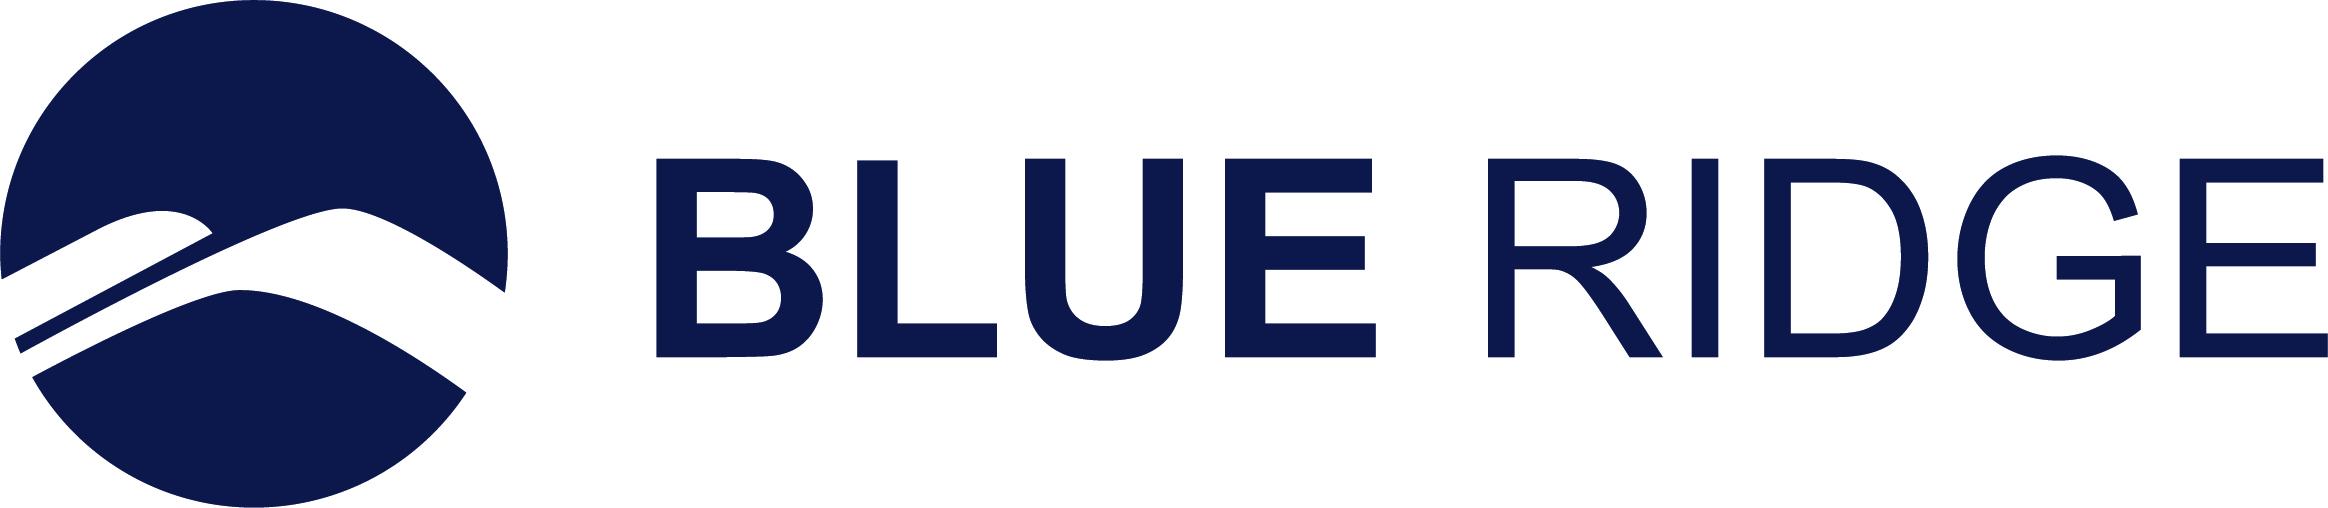 Registration Open for Blue Ridge BLUEPRINT Virtual Conference October 5-6